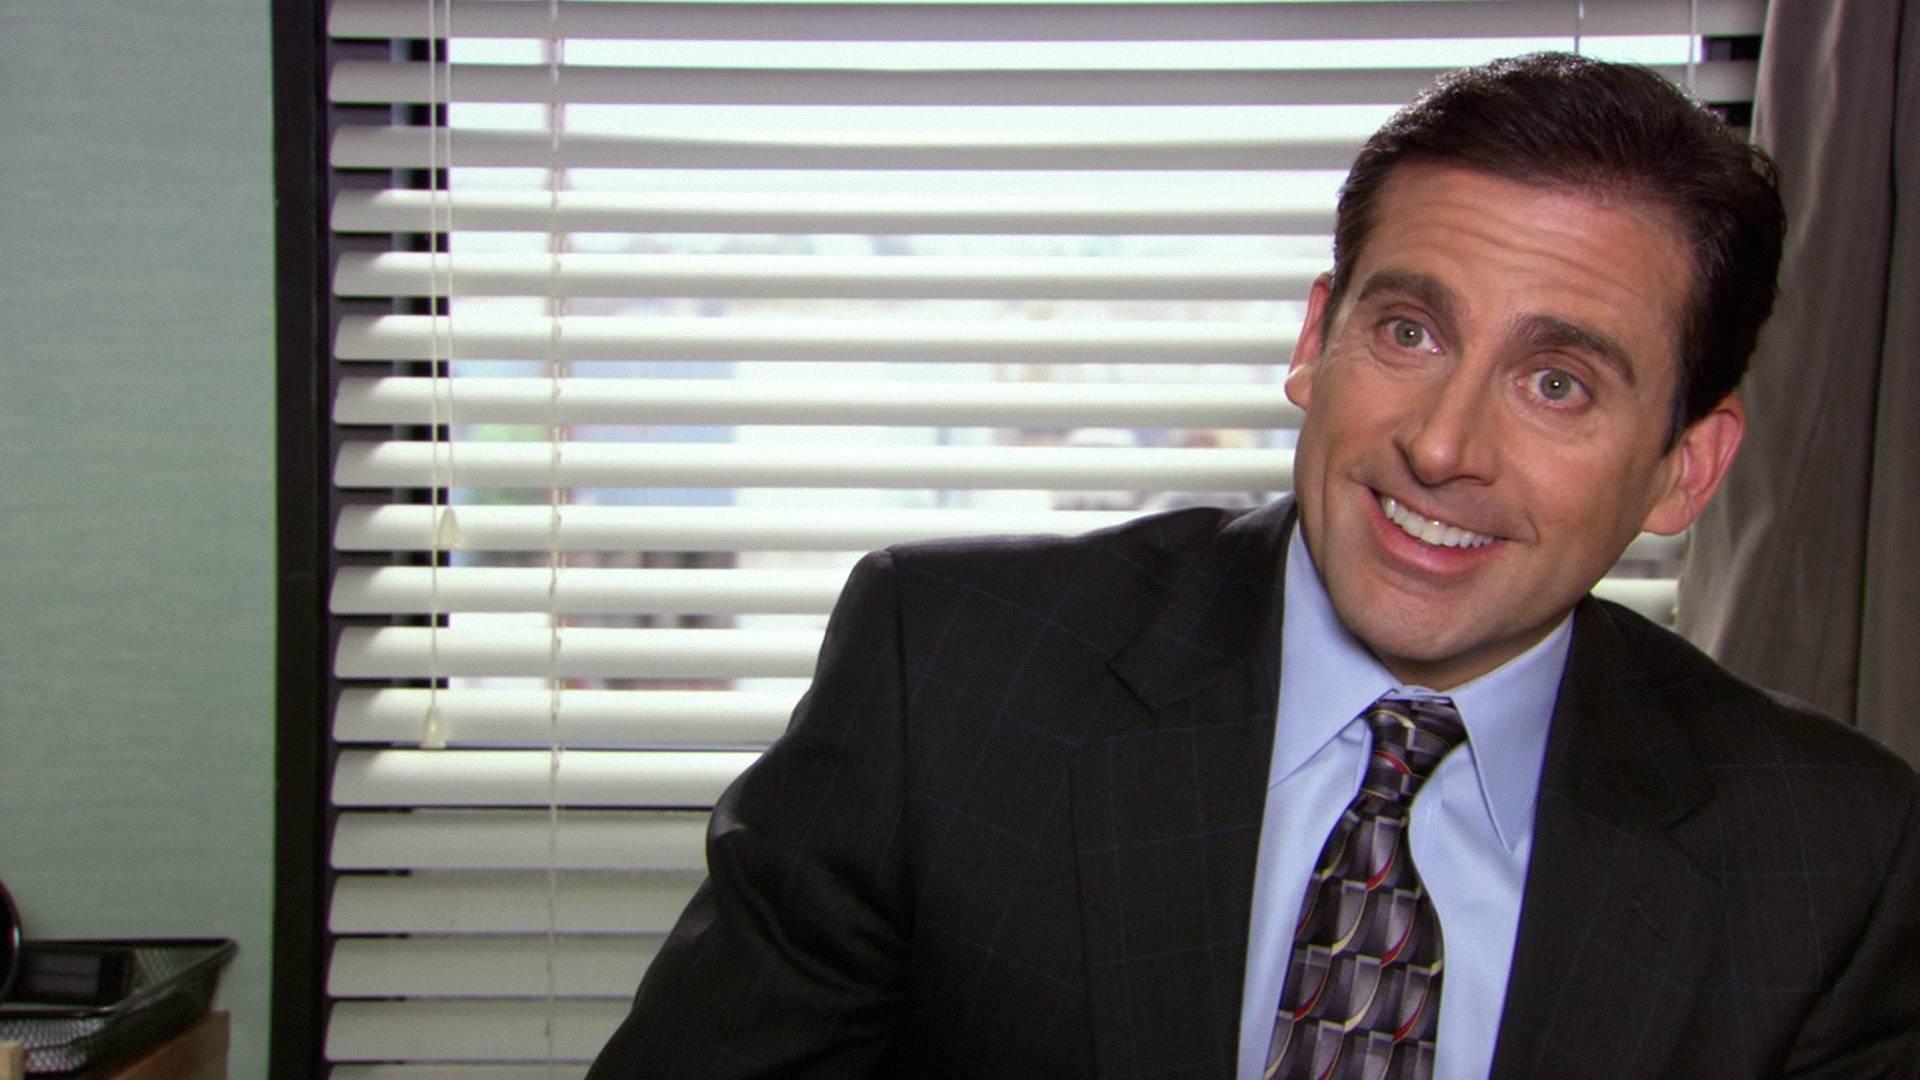 The Office Season 3 Episode 24